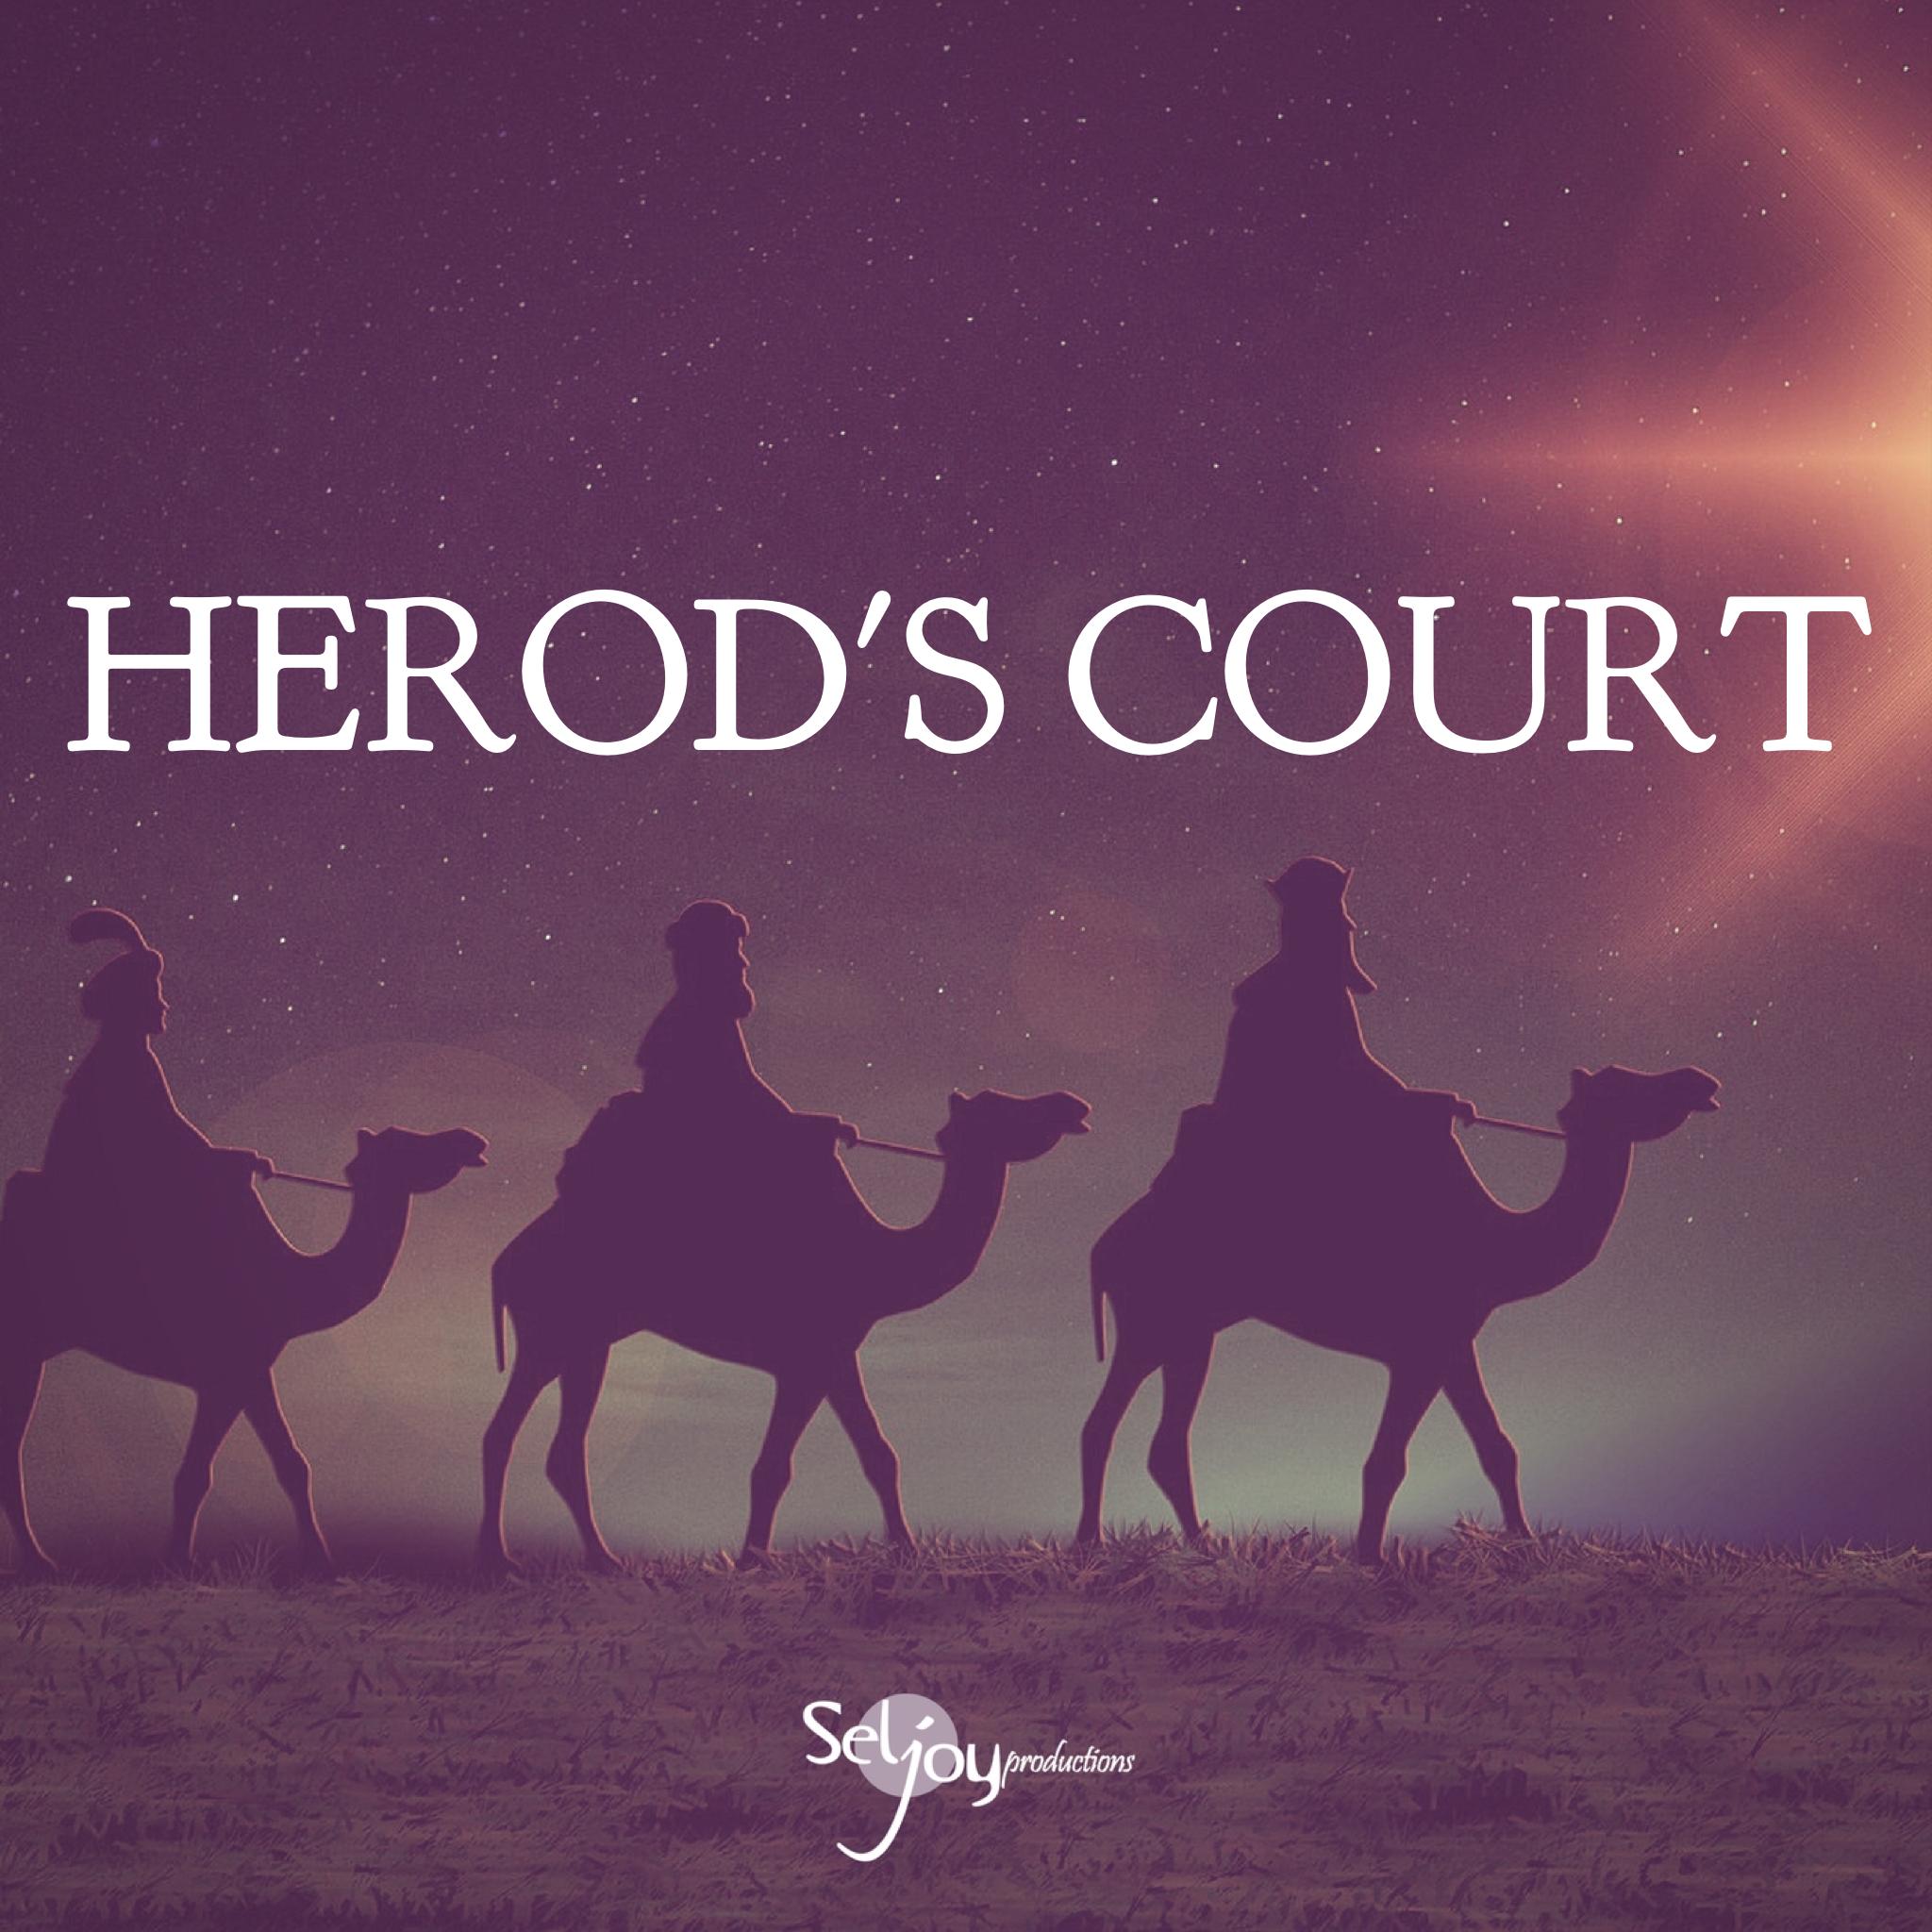 Herod's Court